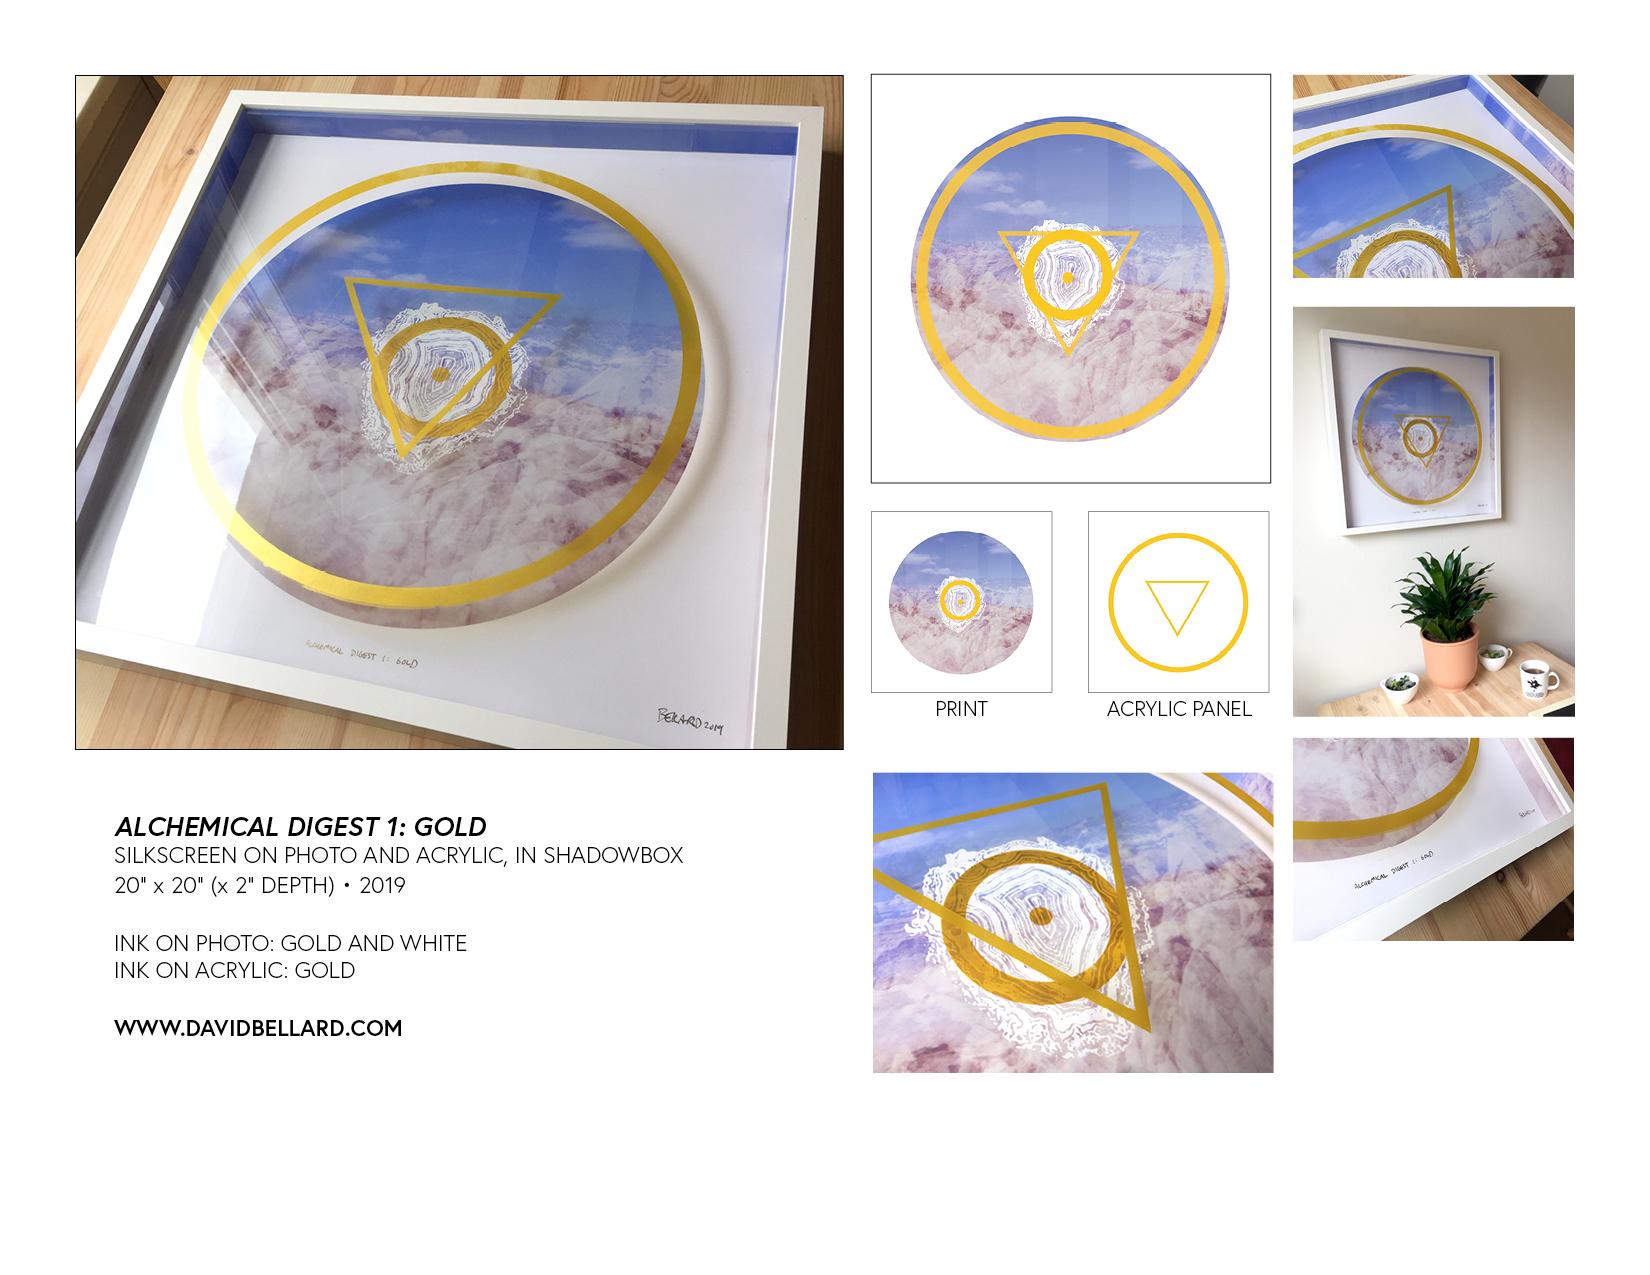 Alchemical Digest Catalog4.jpg